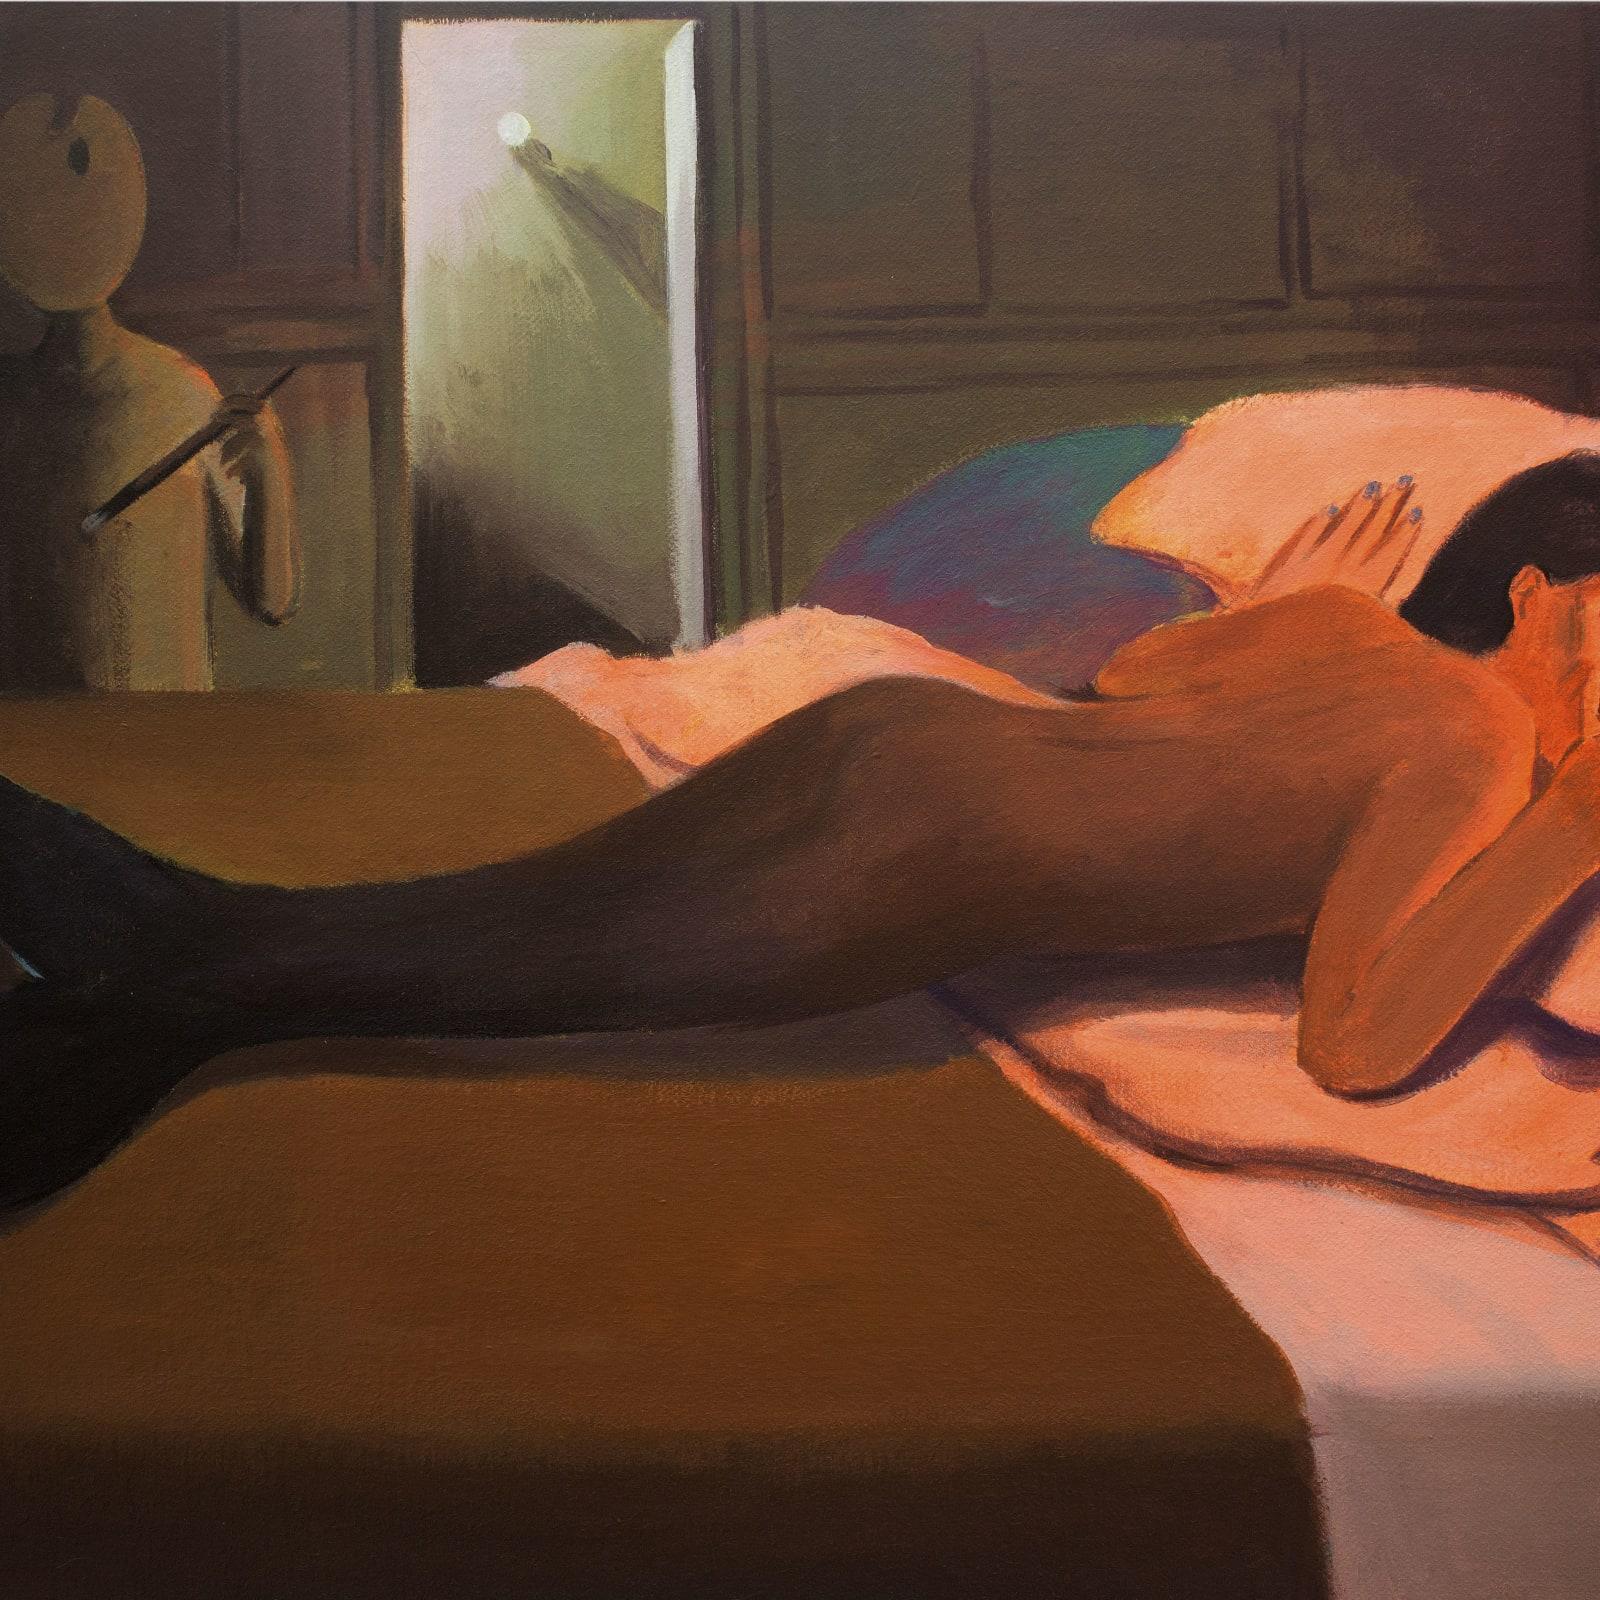 Cai Zebin 蔡泽滨, The Painter's Gaze 画家的凝视, 2019